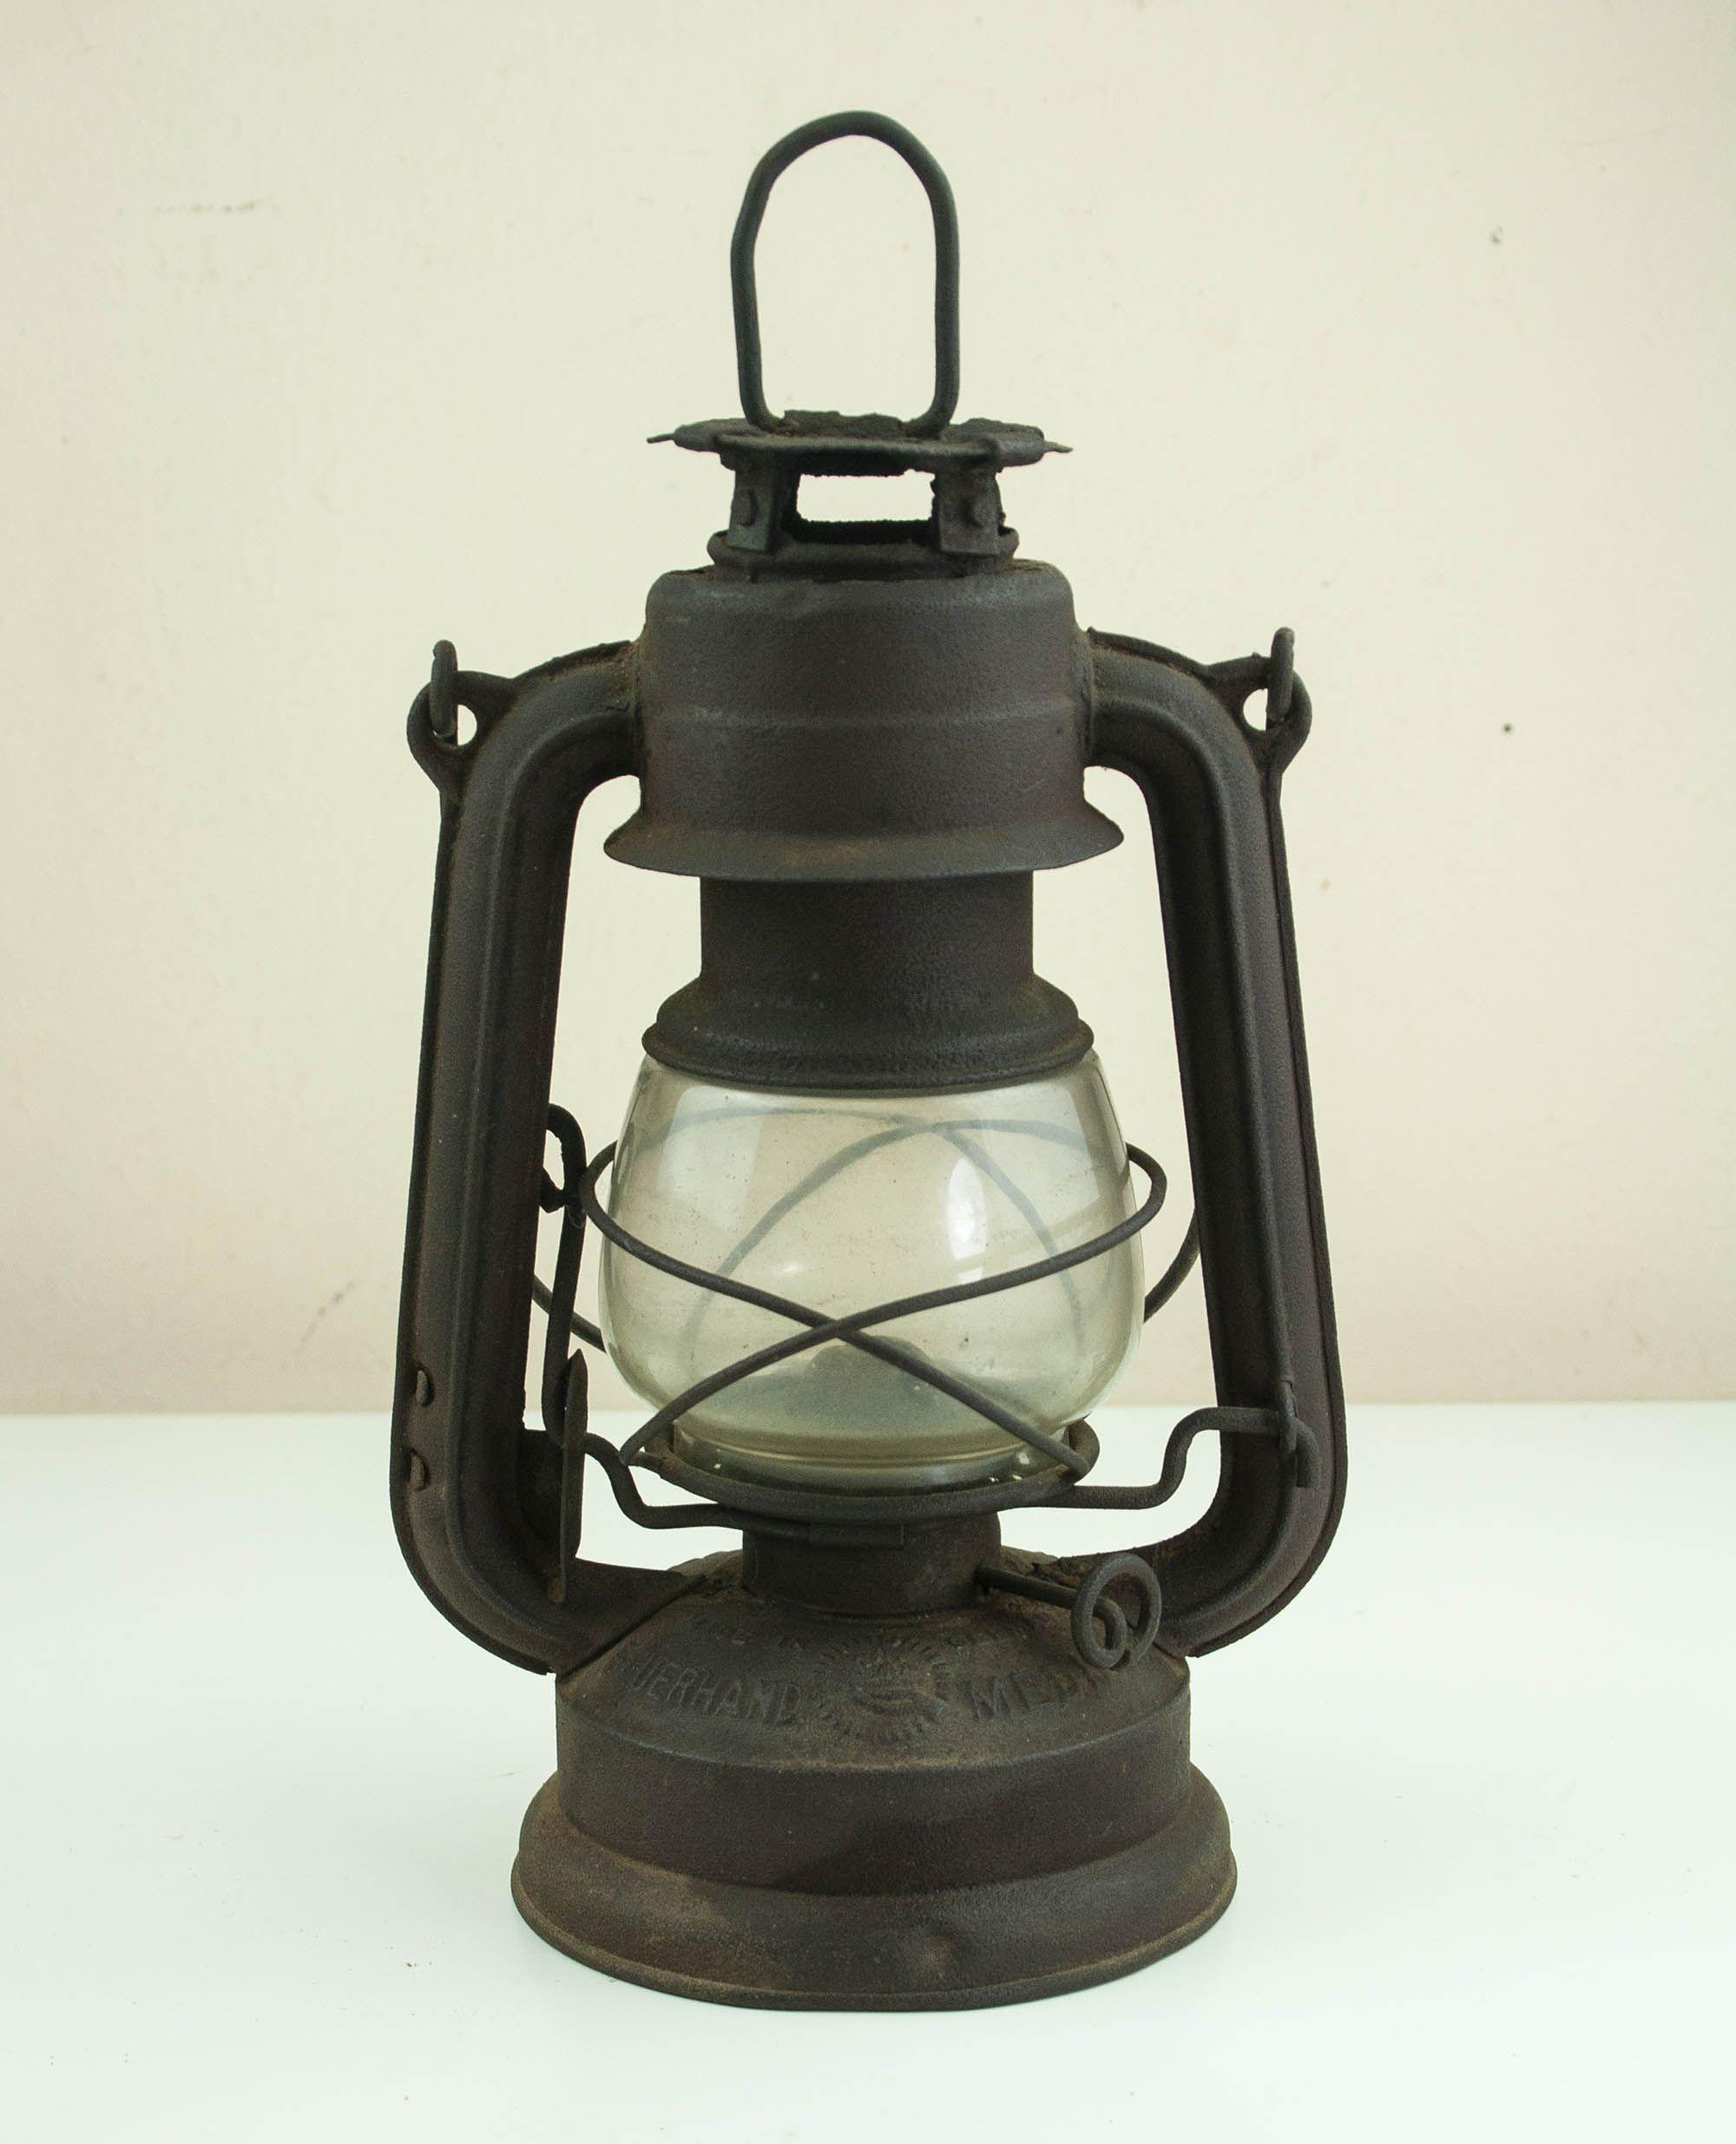 Vintage German Kerosine Lamp, Old Farmhouse Lantern Light